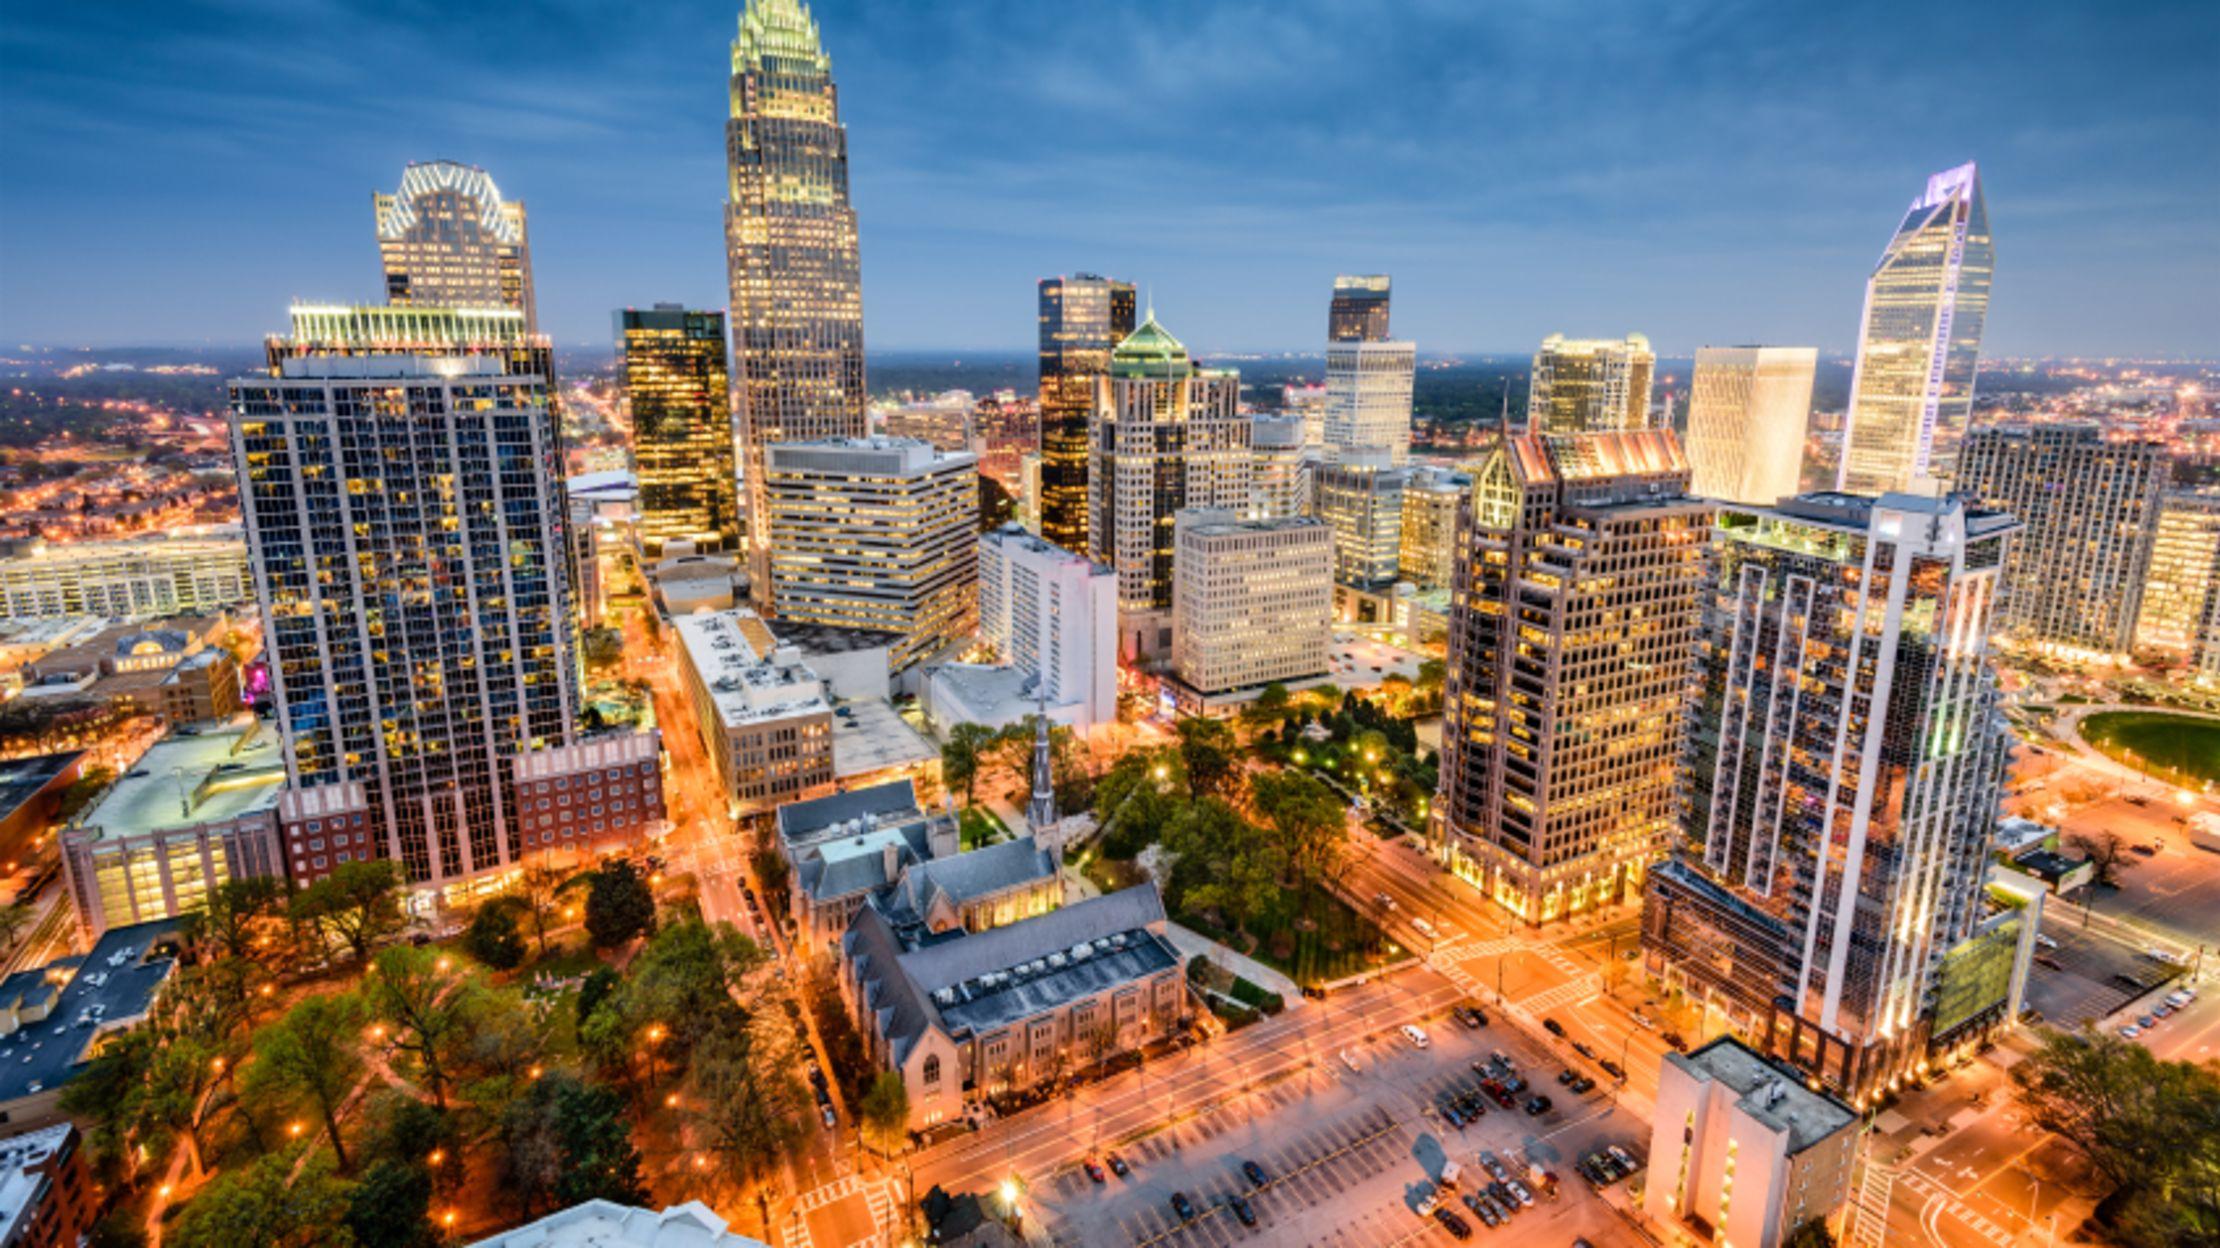 Free photo: Charlotte skyline - America, Skyline, Night